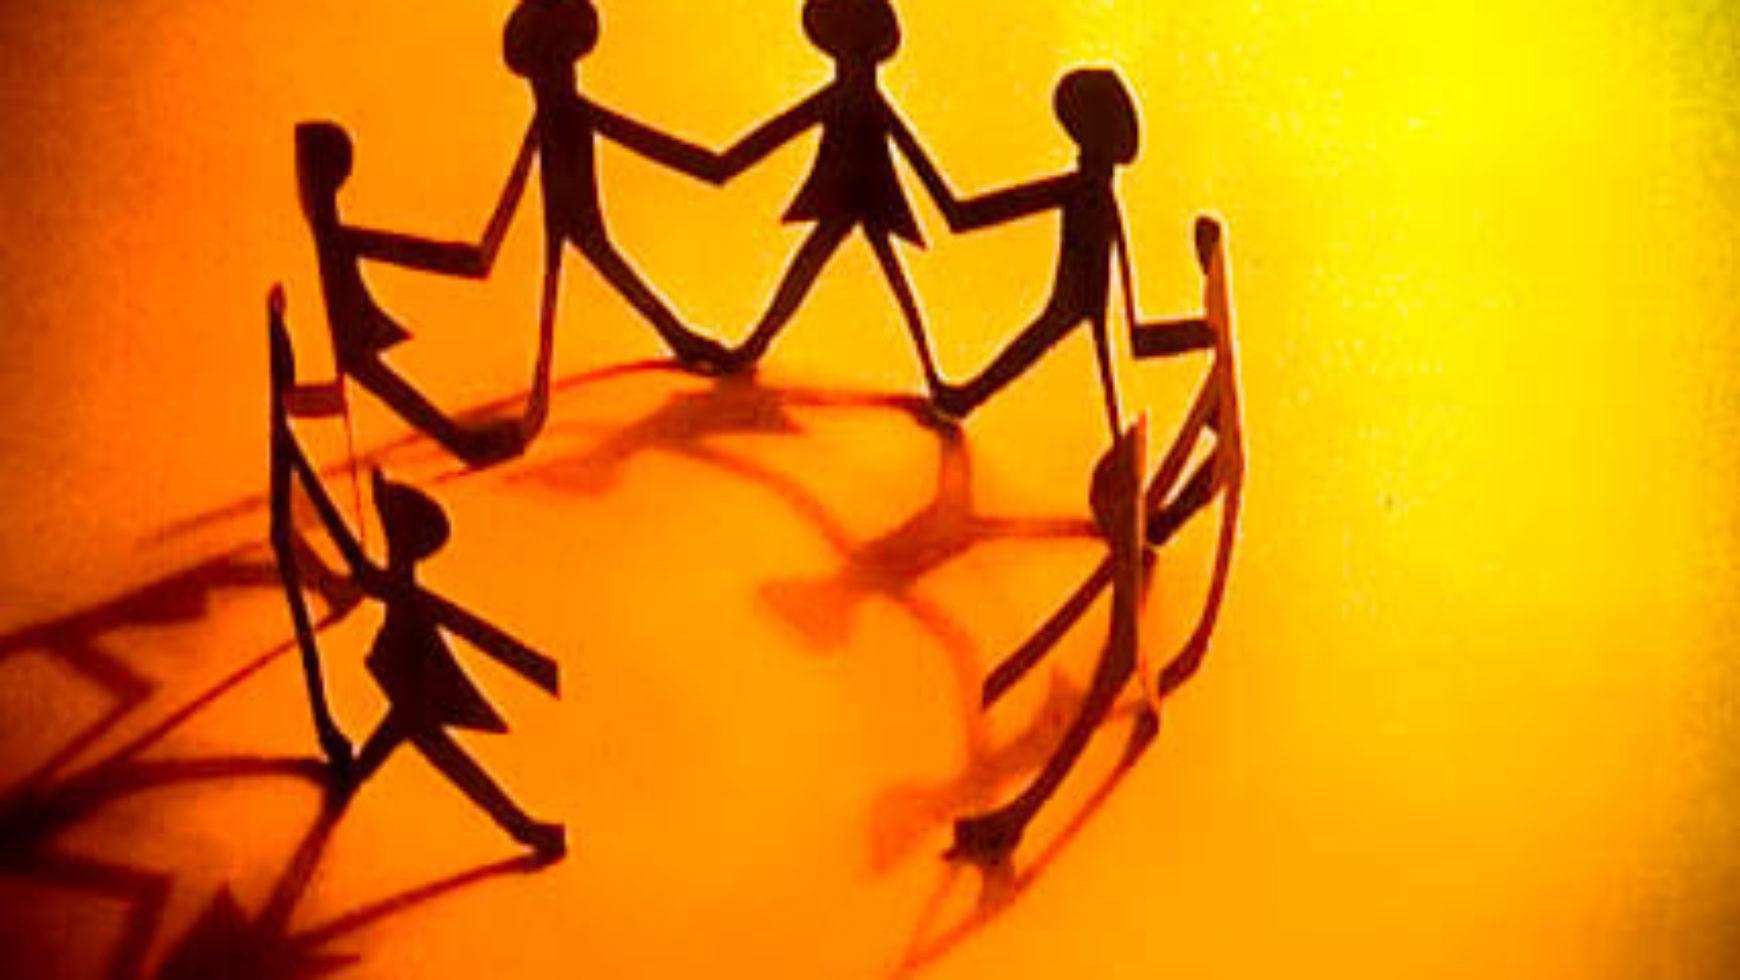 Why We Need Fellowship